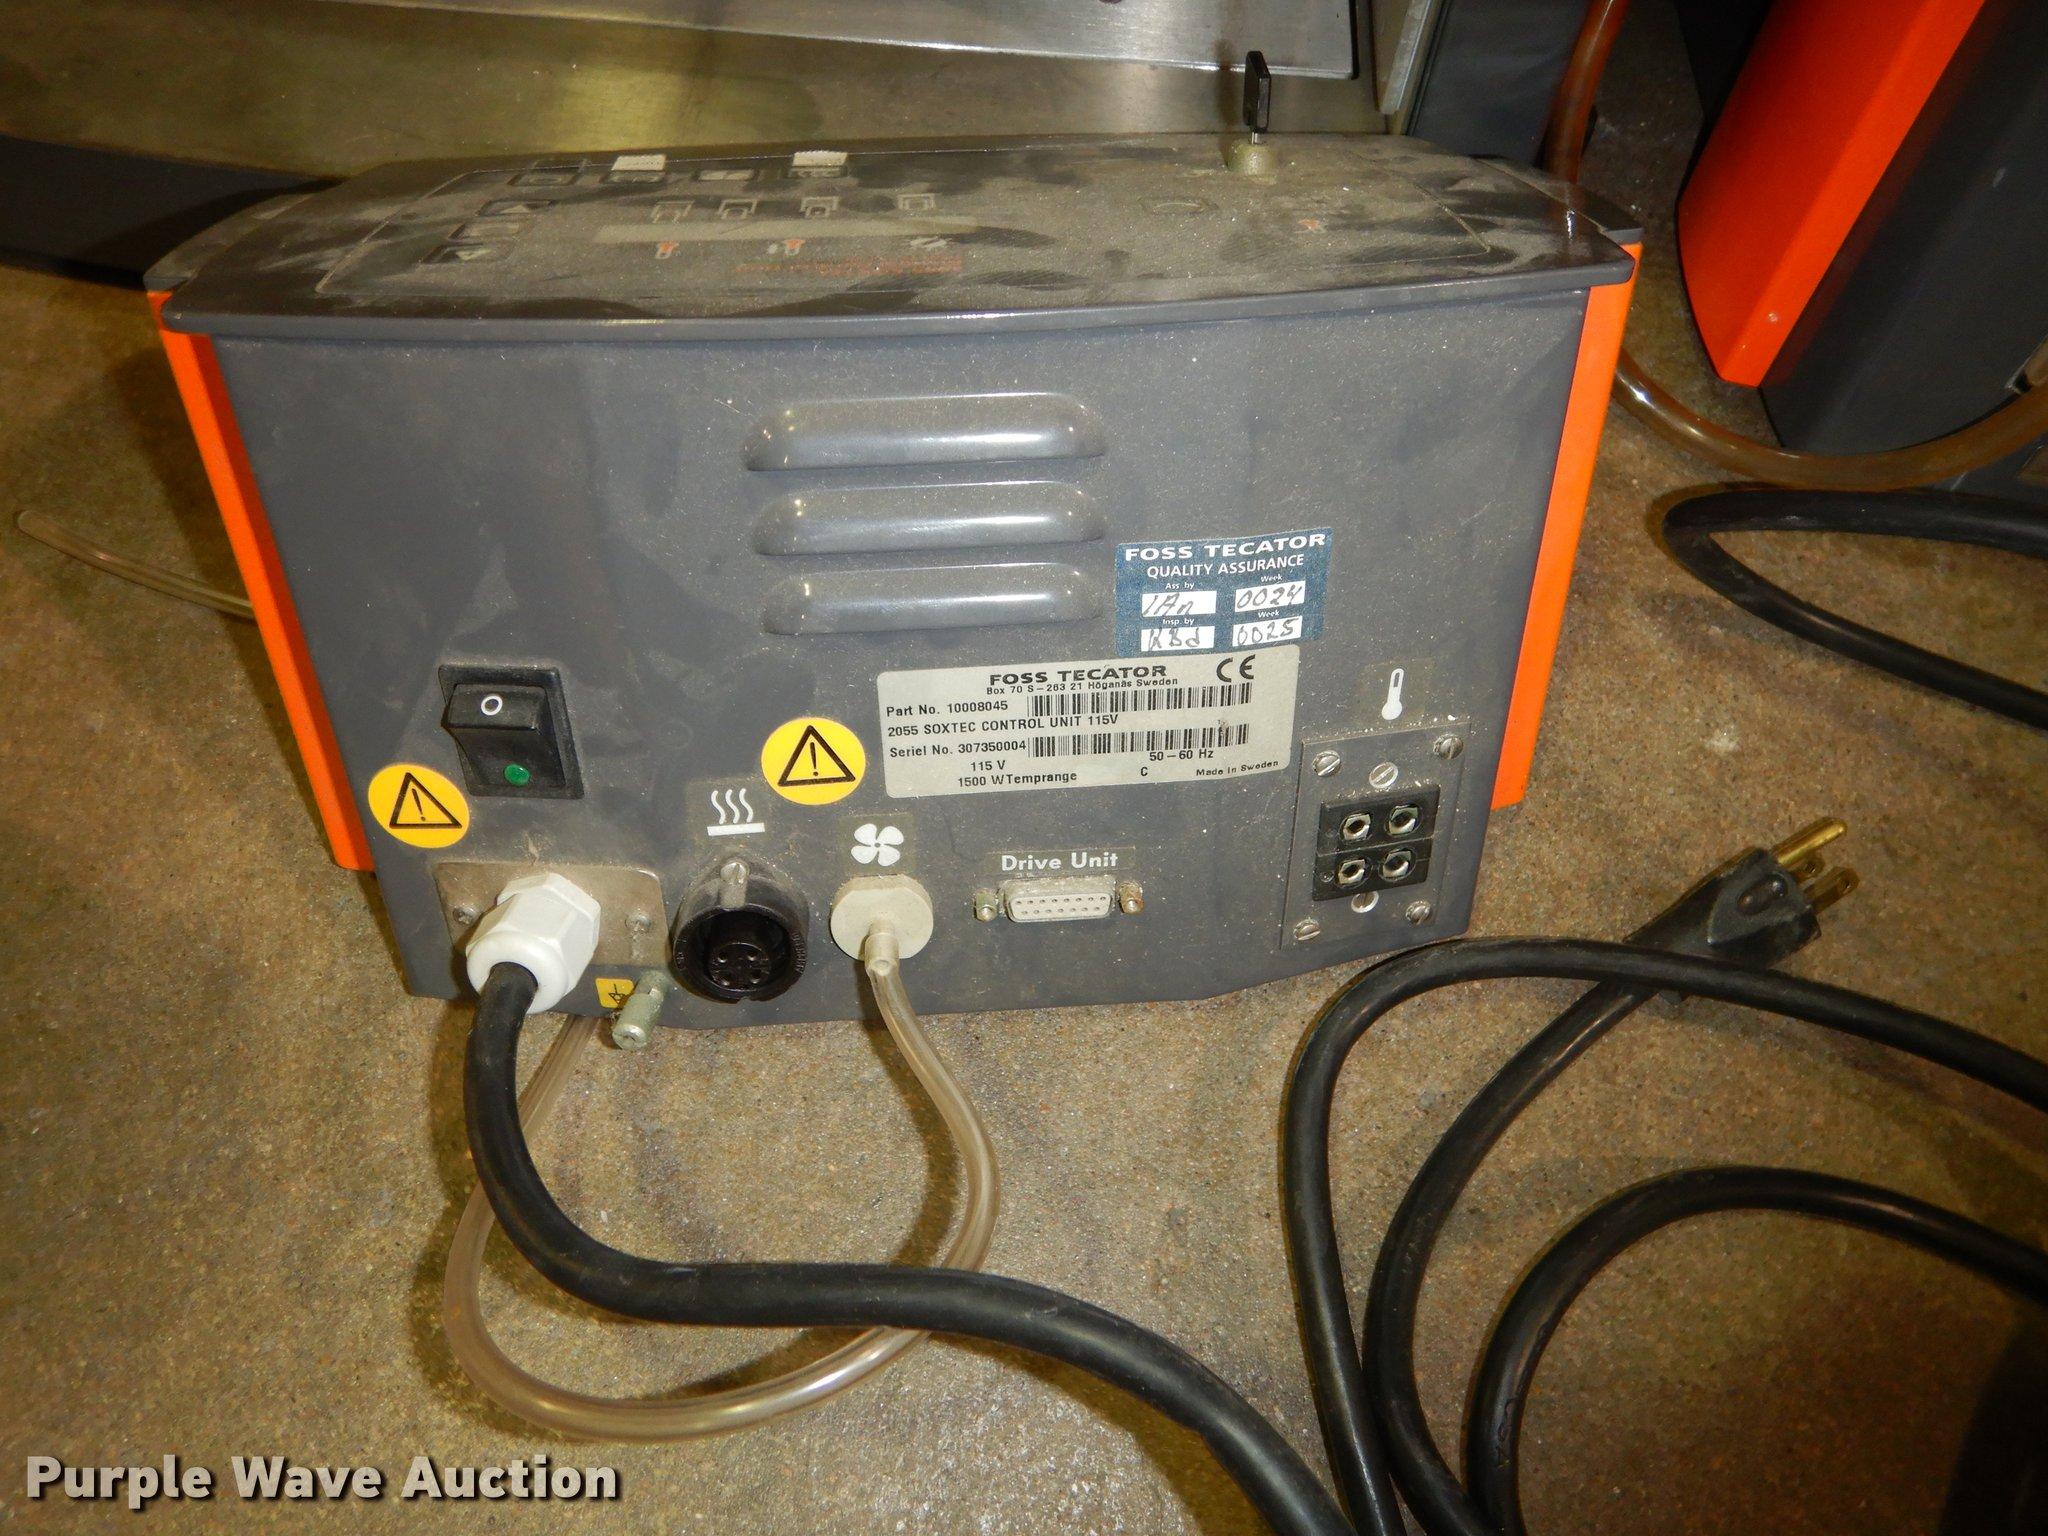 2) Avanti 2055 Soxtec Manual Foss Tec-ator extraction units...